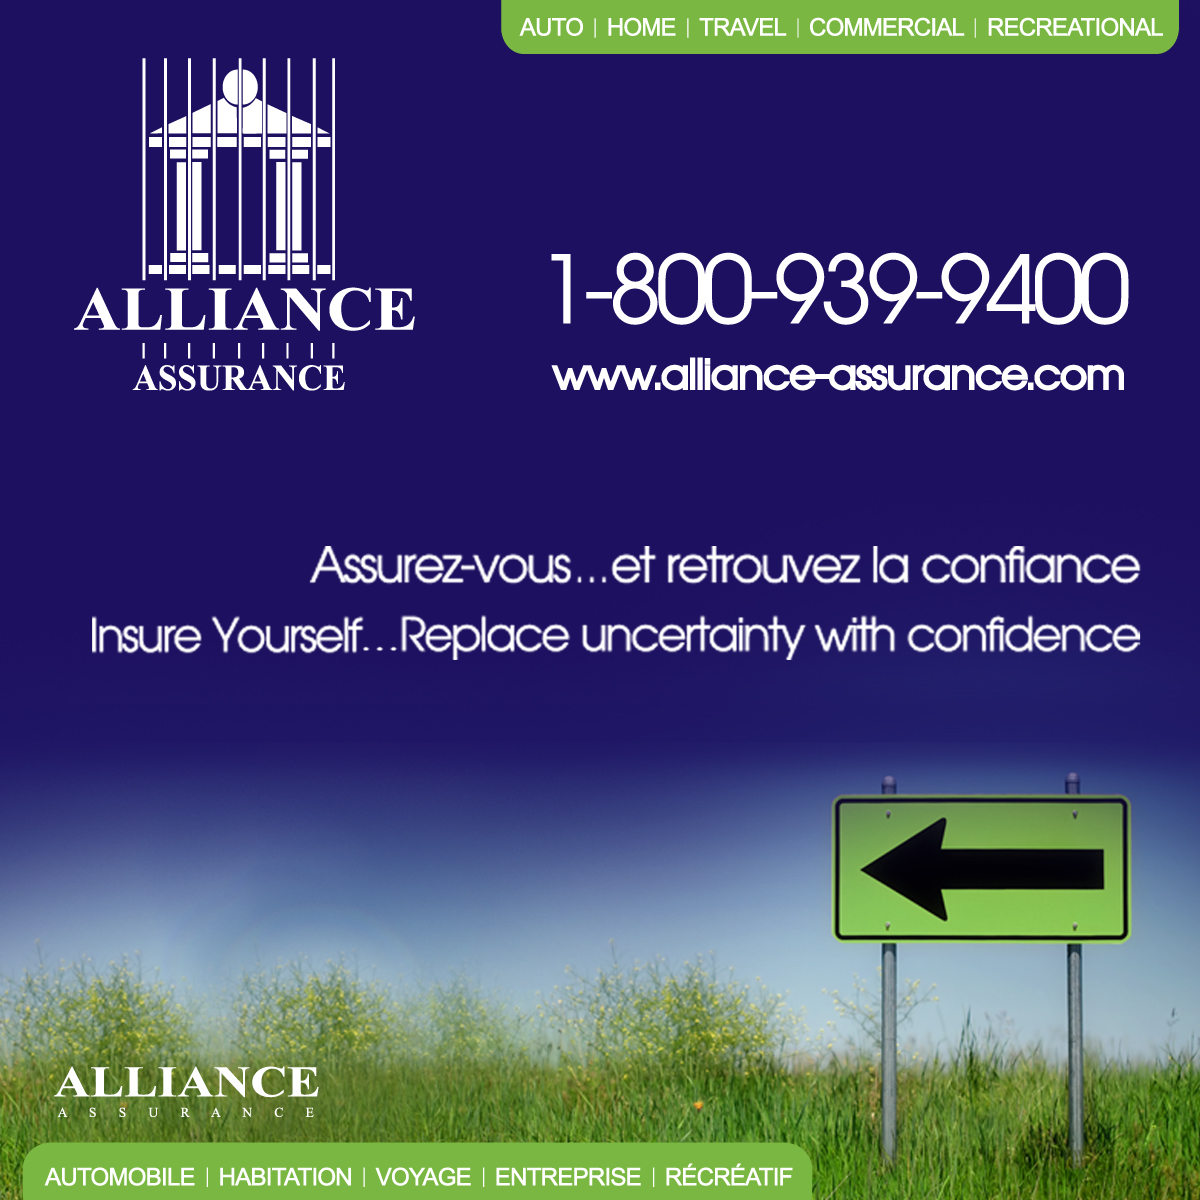 Alliance Assurance Inc - Photo 2